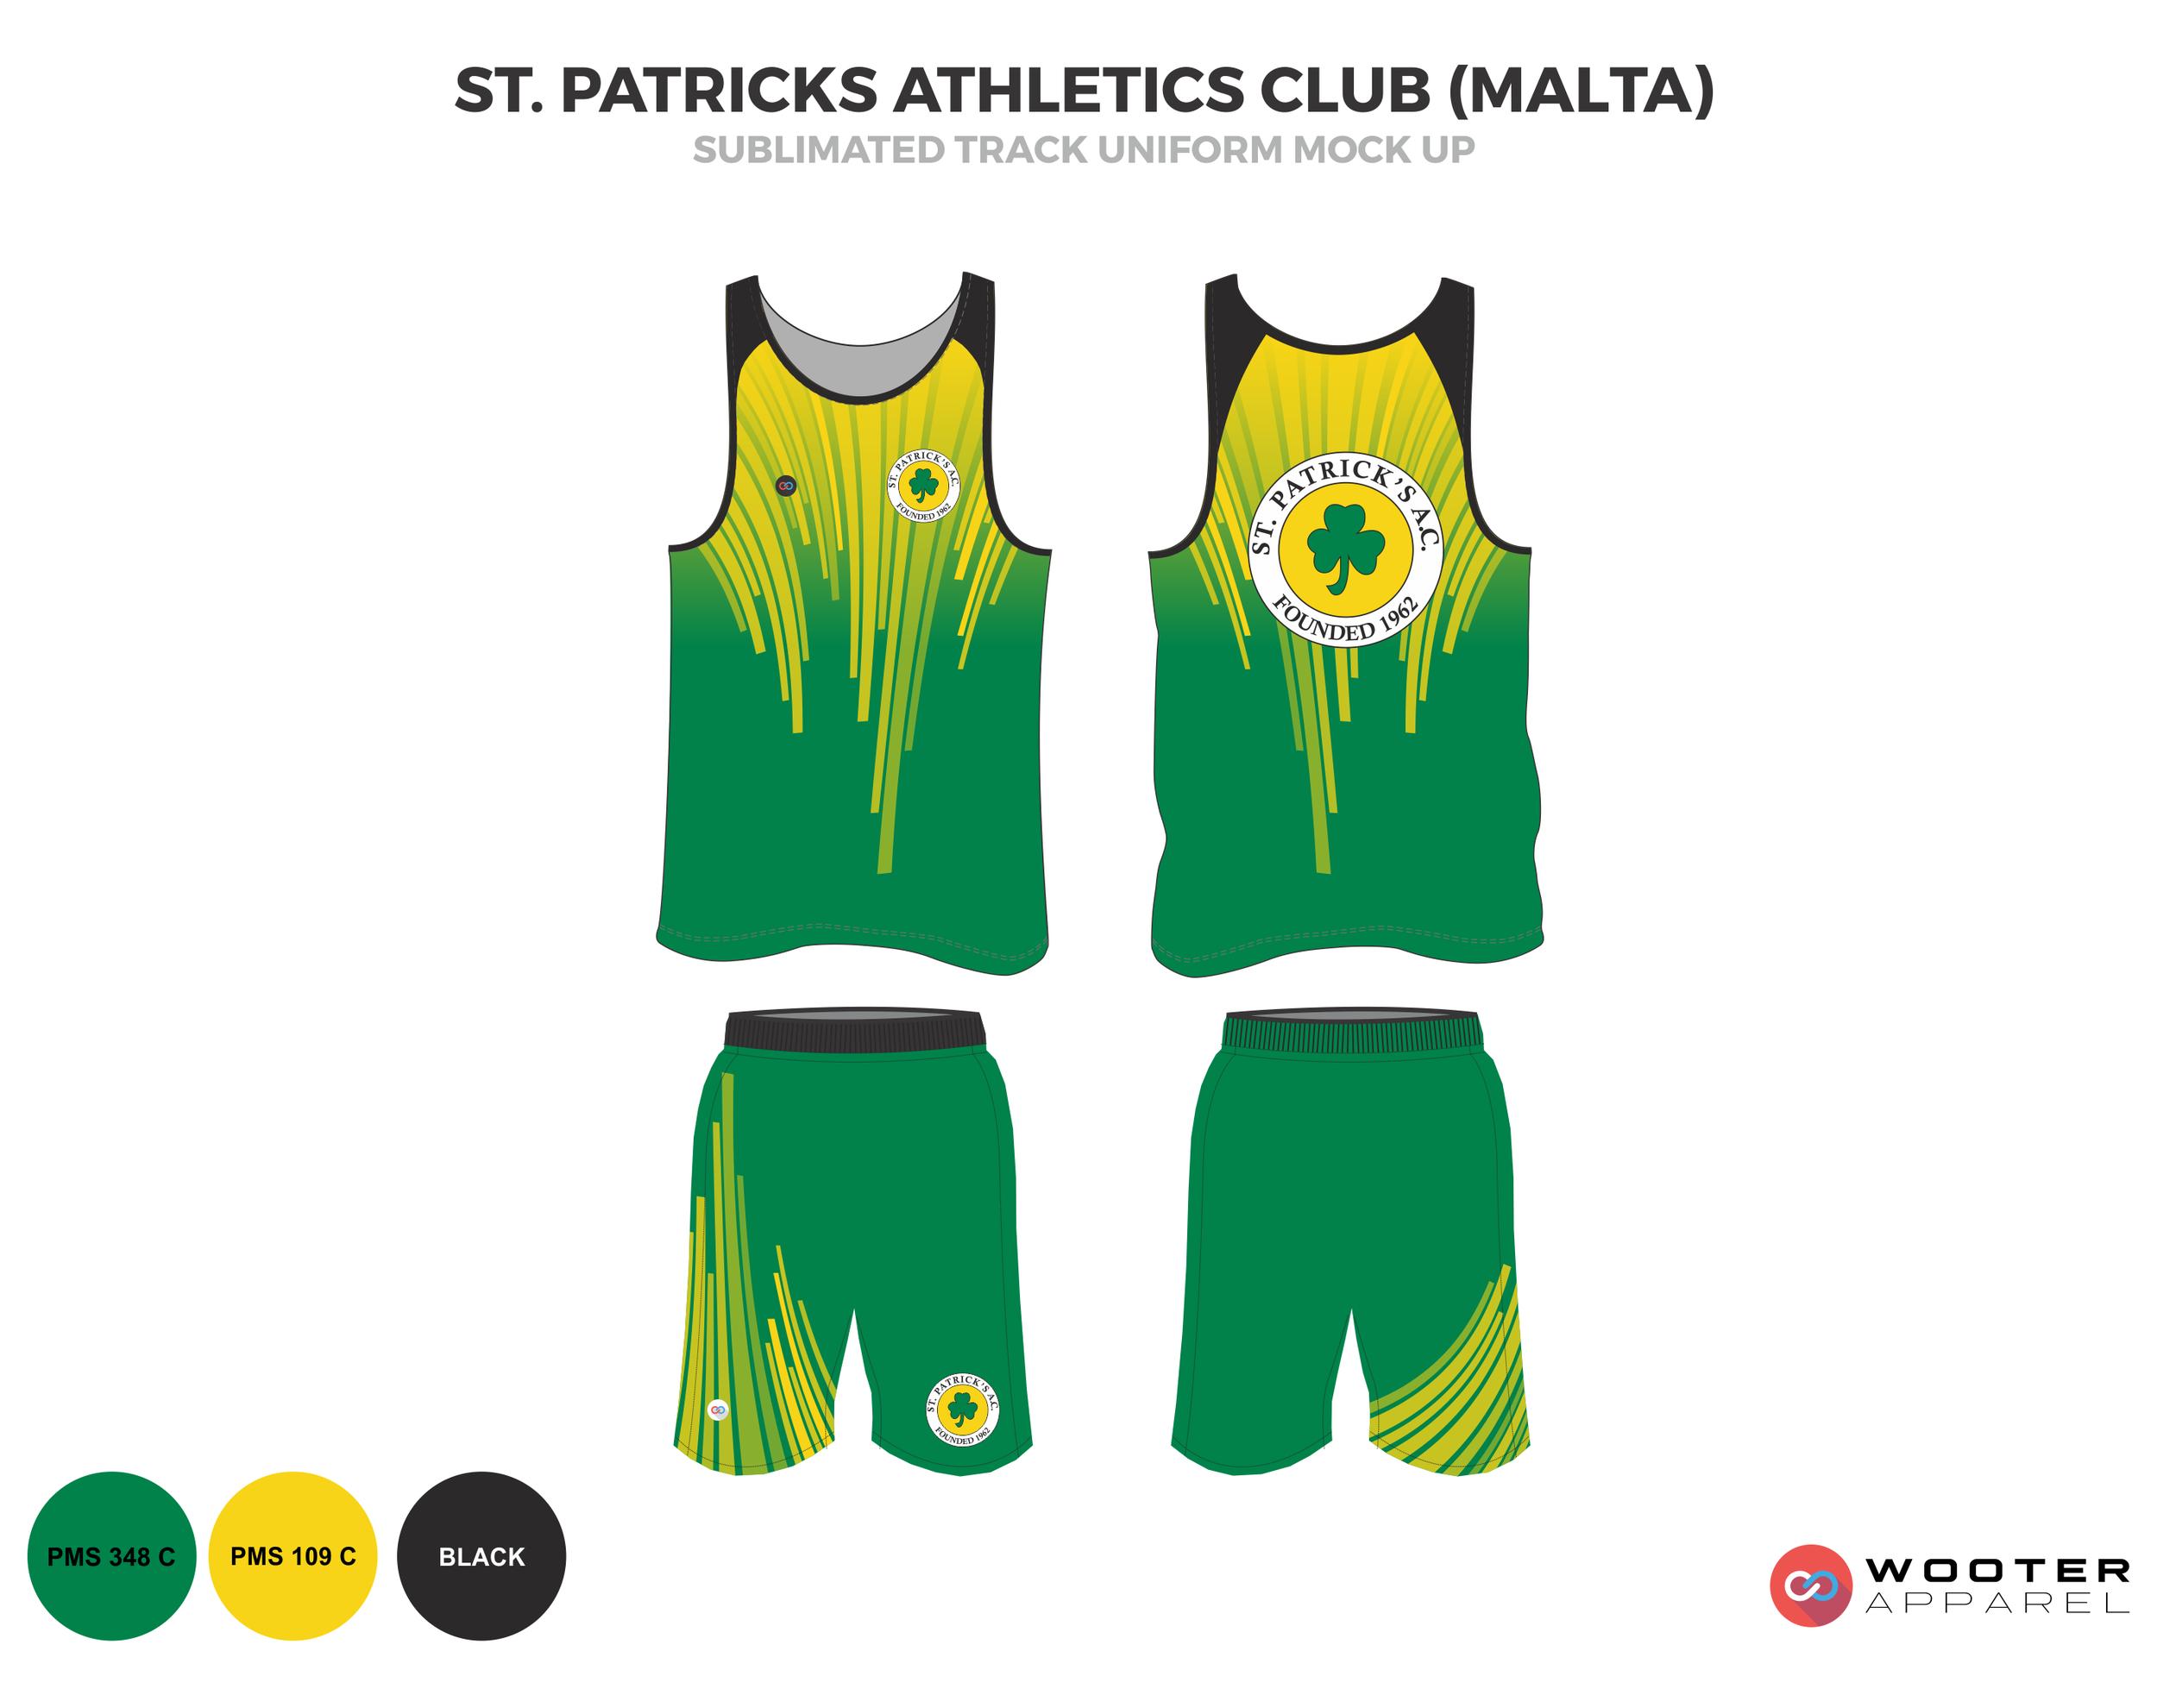 St Patricks Athletics Club (Malta) - Sublimated Track Uniform -  2017 v2 2.png